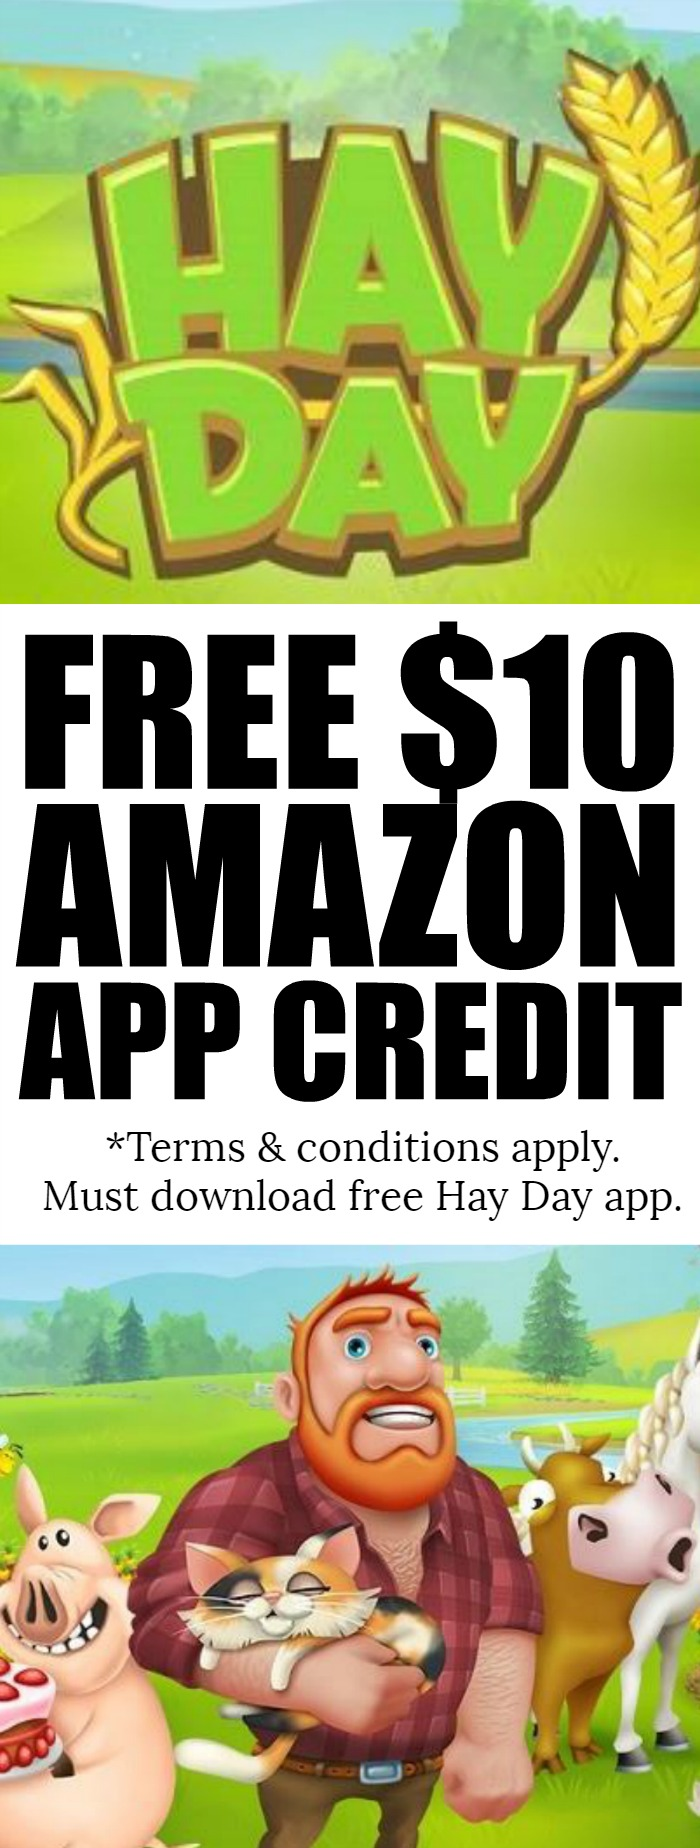 Free $10 Amazon App Credit